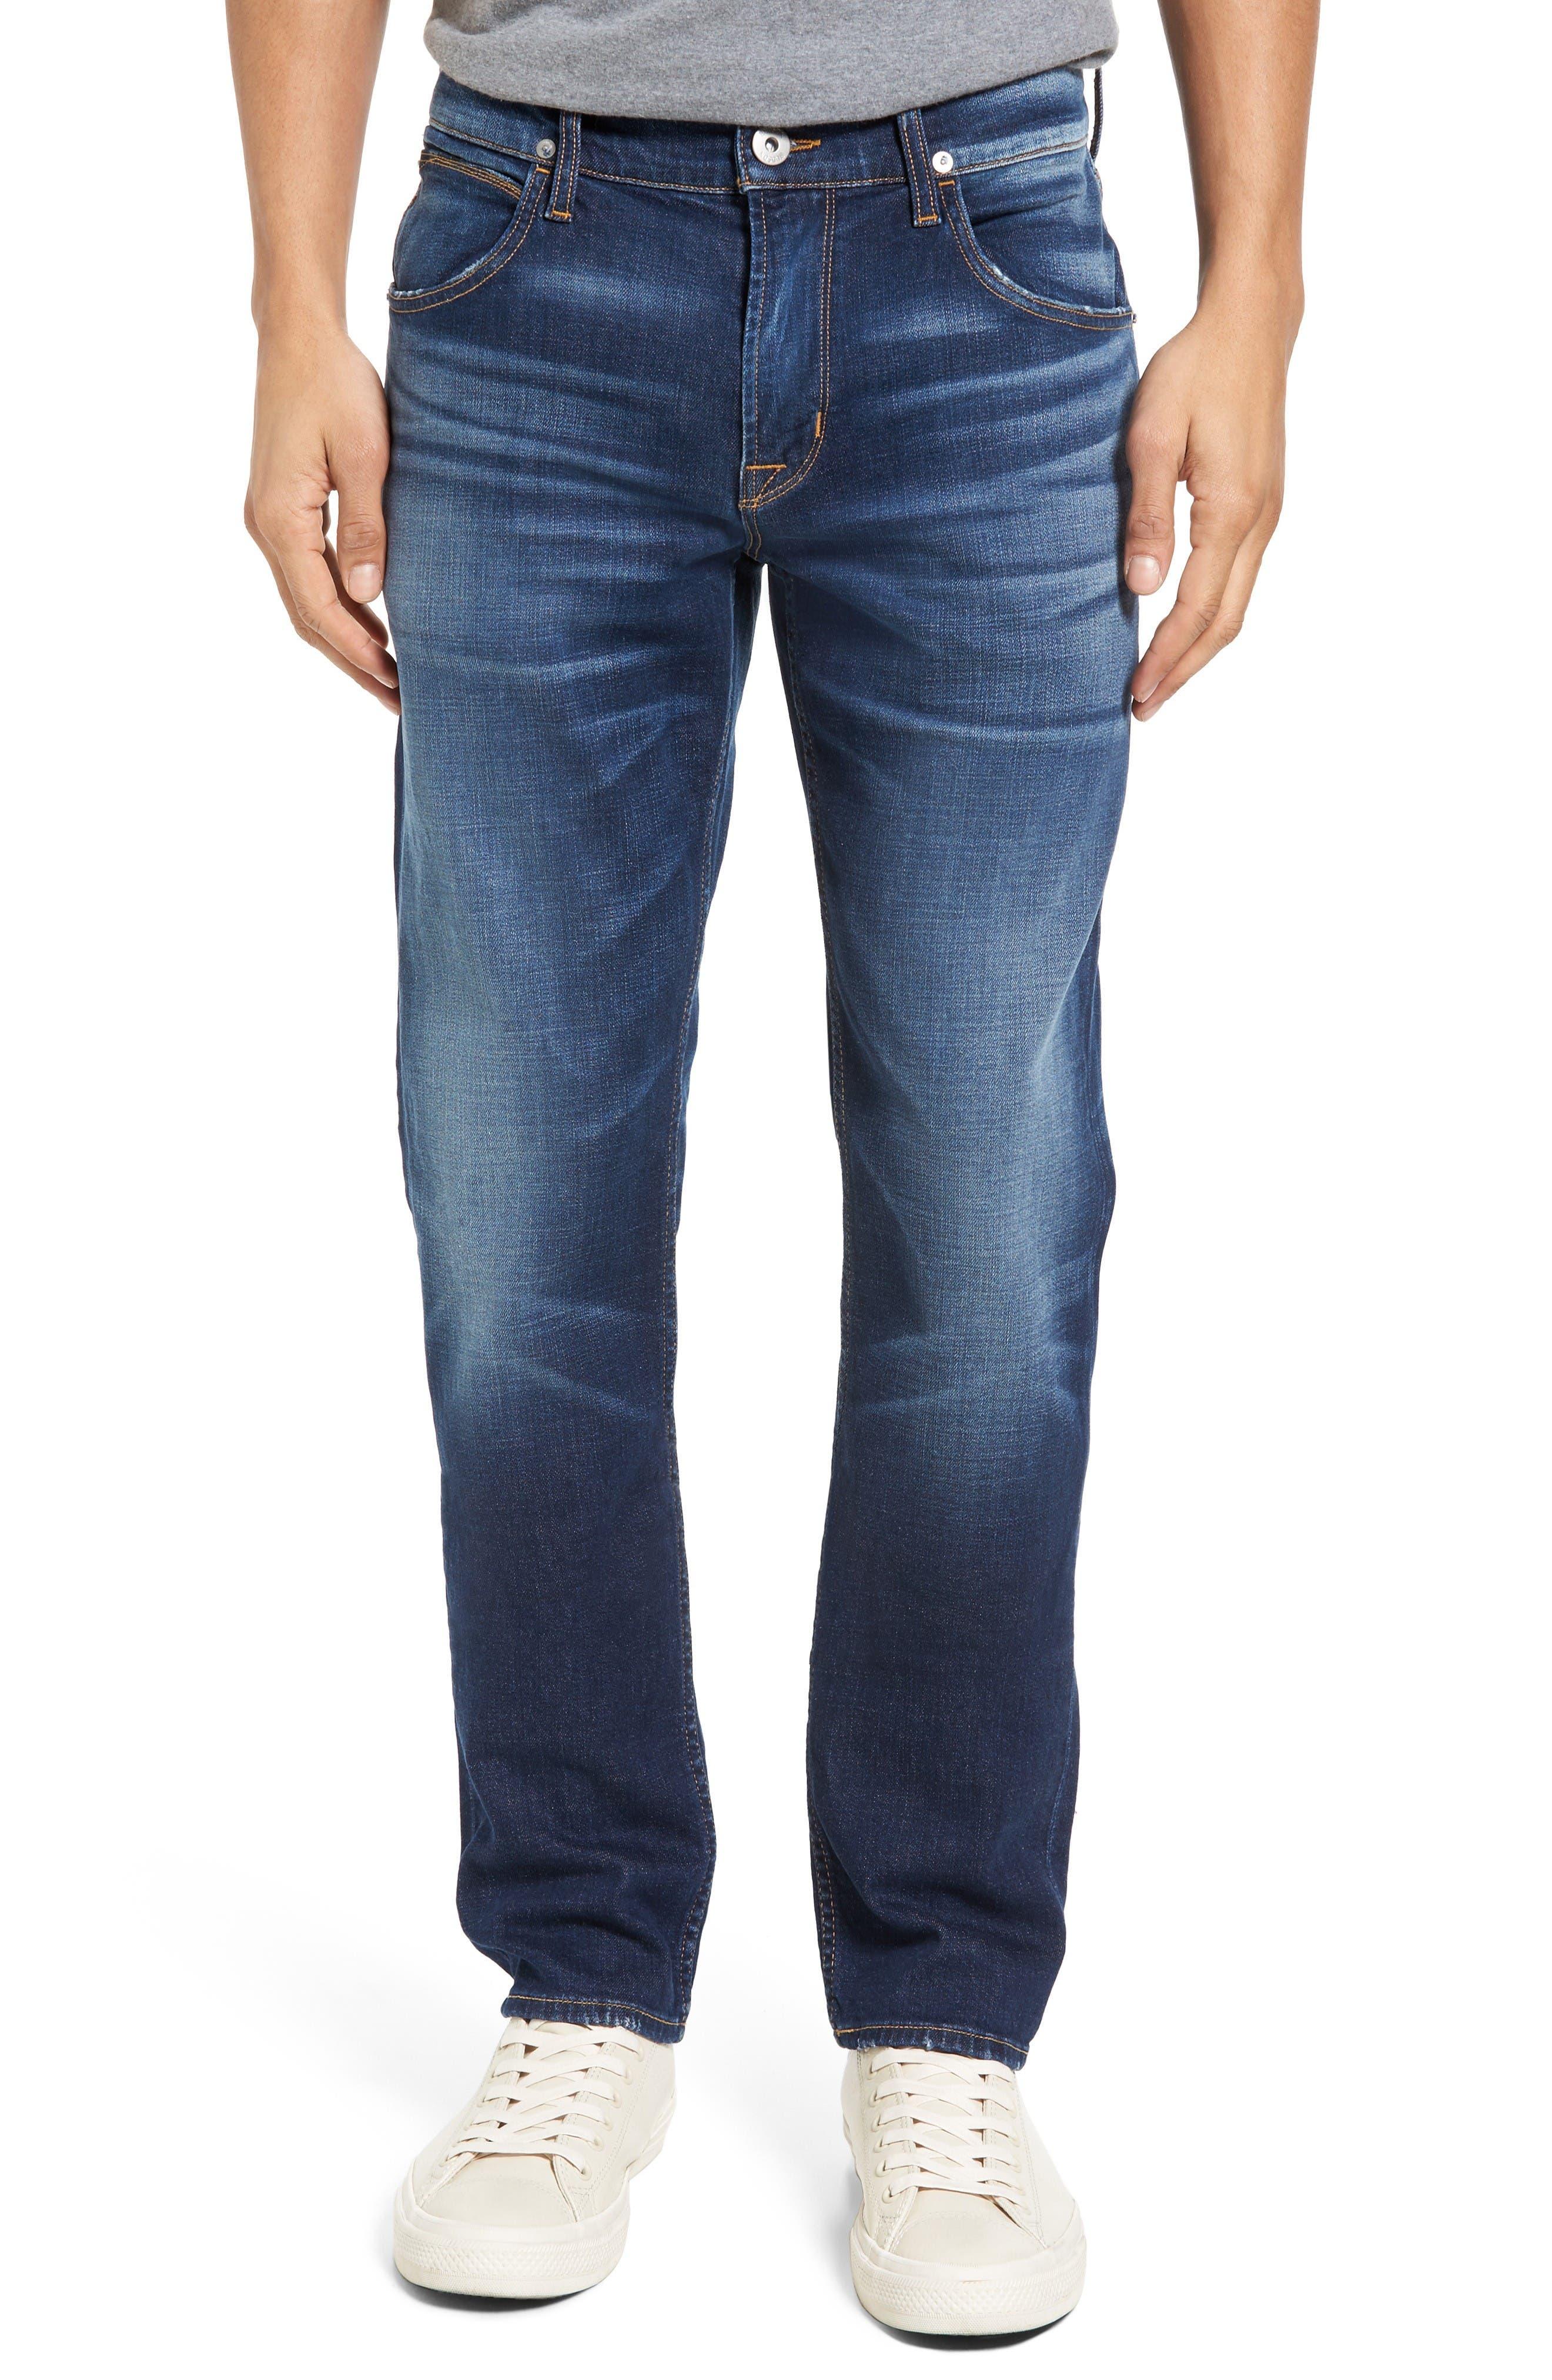 Blake Slim Fit Jeans,                         Main,                         color, Genuine